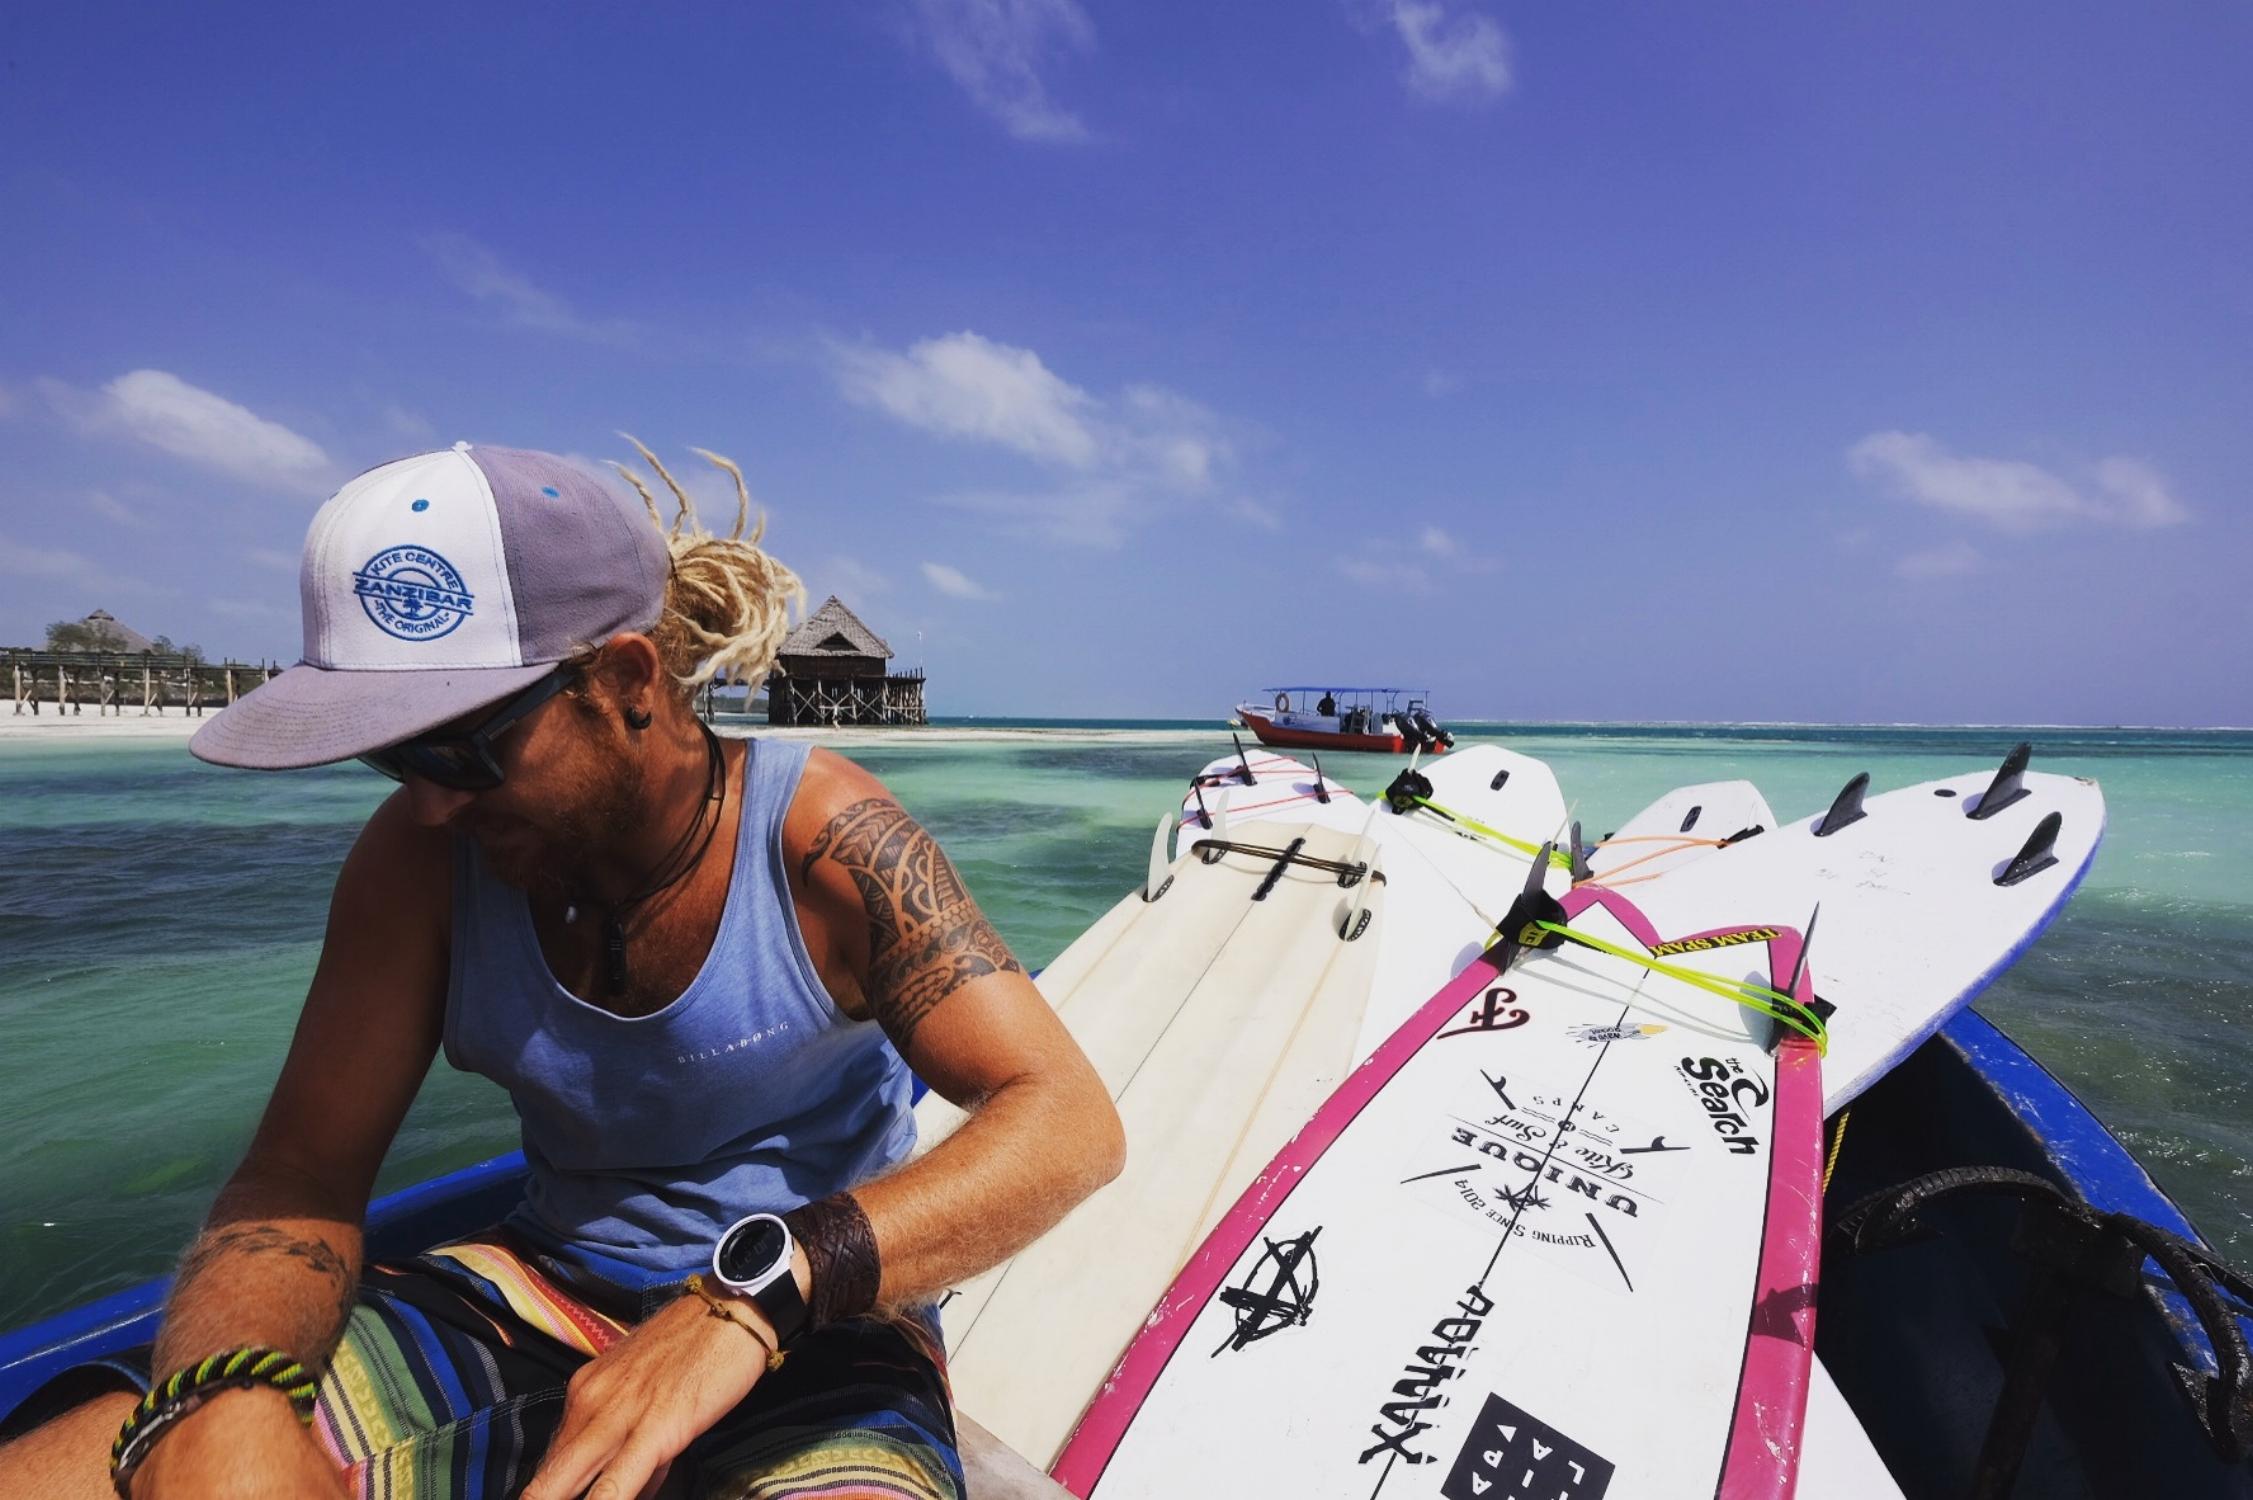 East Africa Surf -